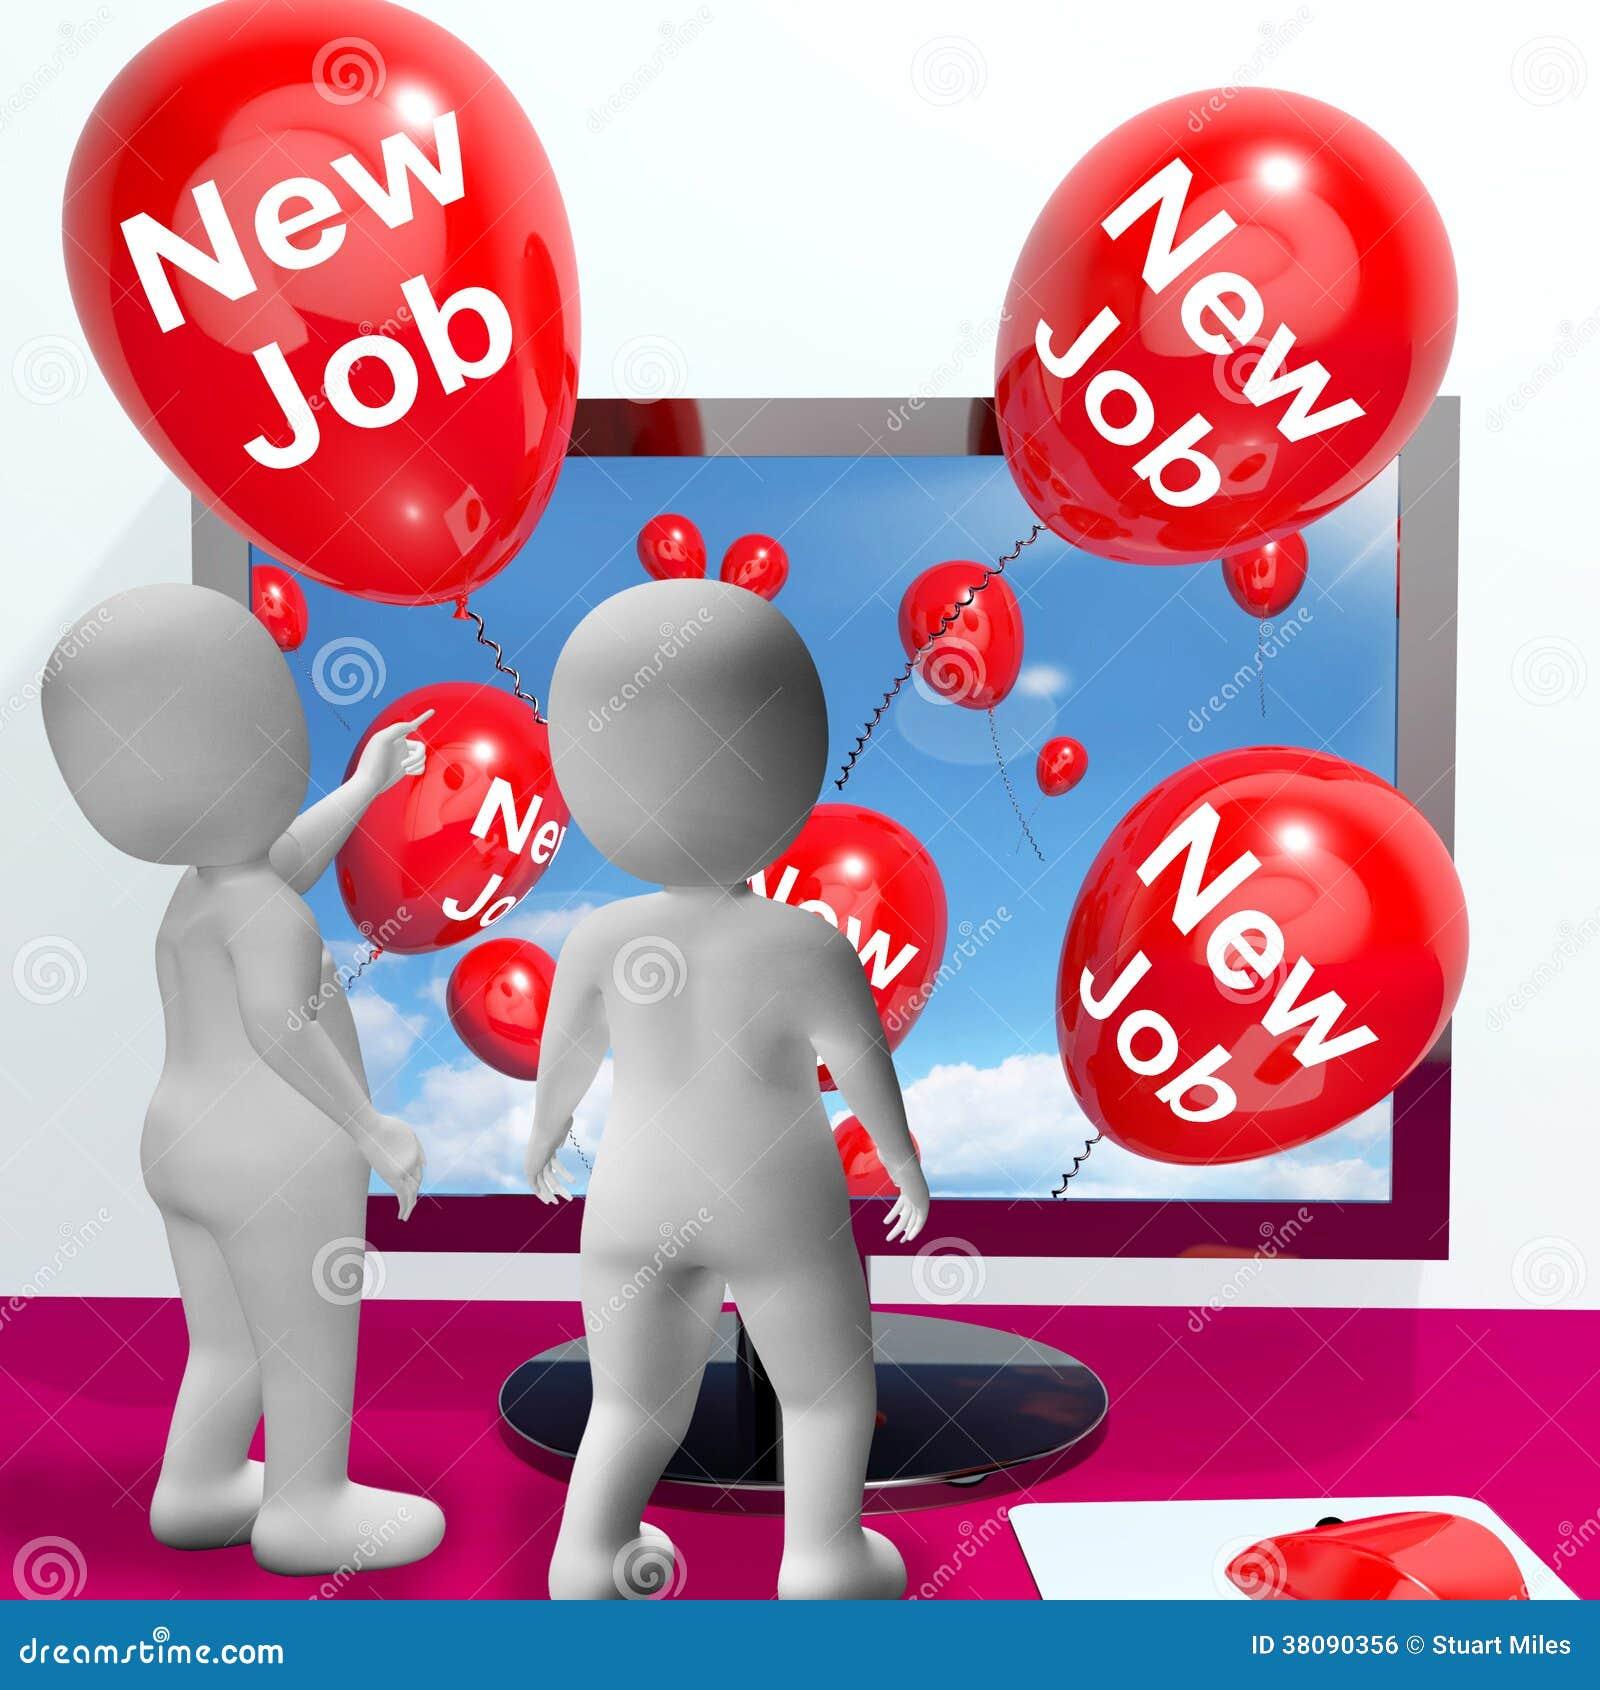 New job balloons show online congratulations stock illustration new job balloons show online congratulations thecheapjerseys Images